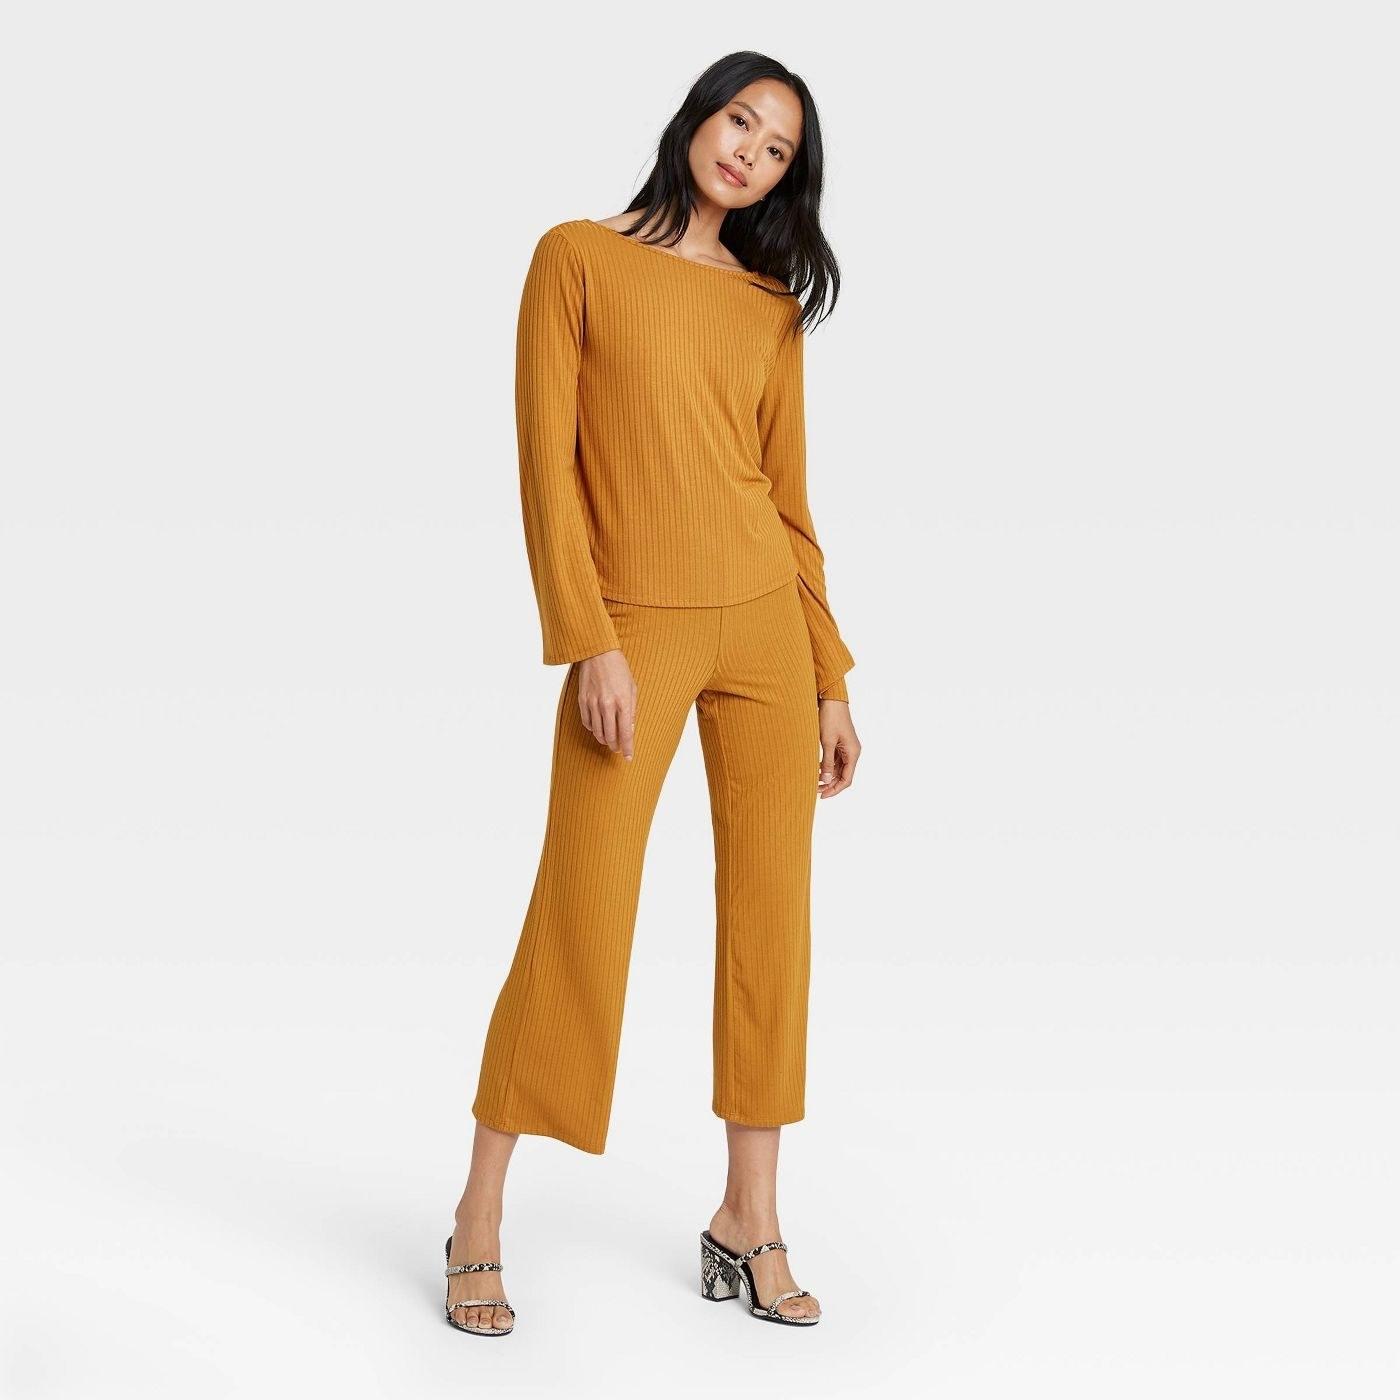 Model in long sleeve boat neck t-shirt